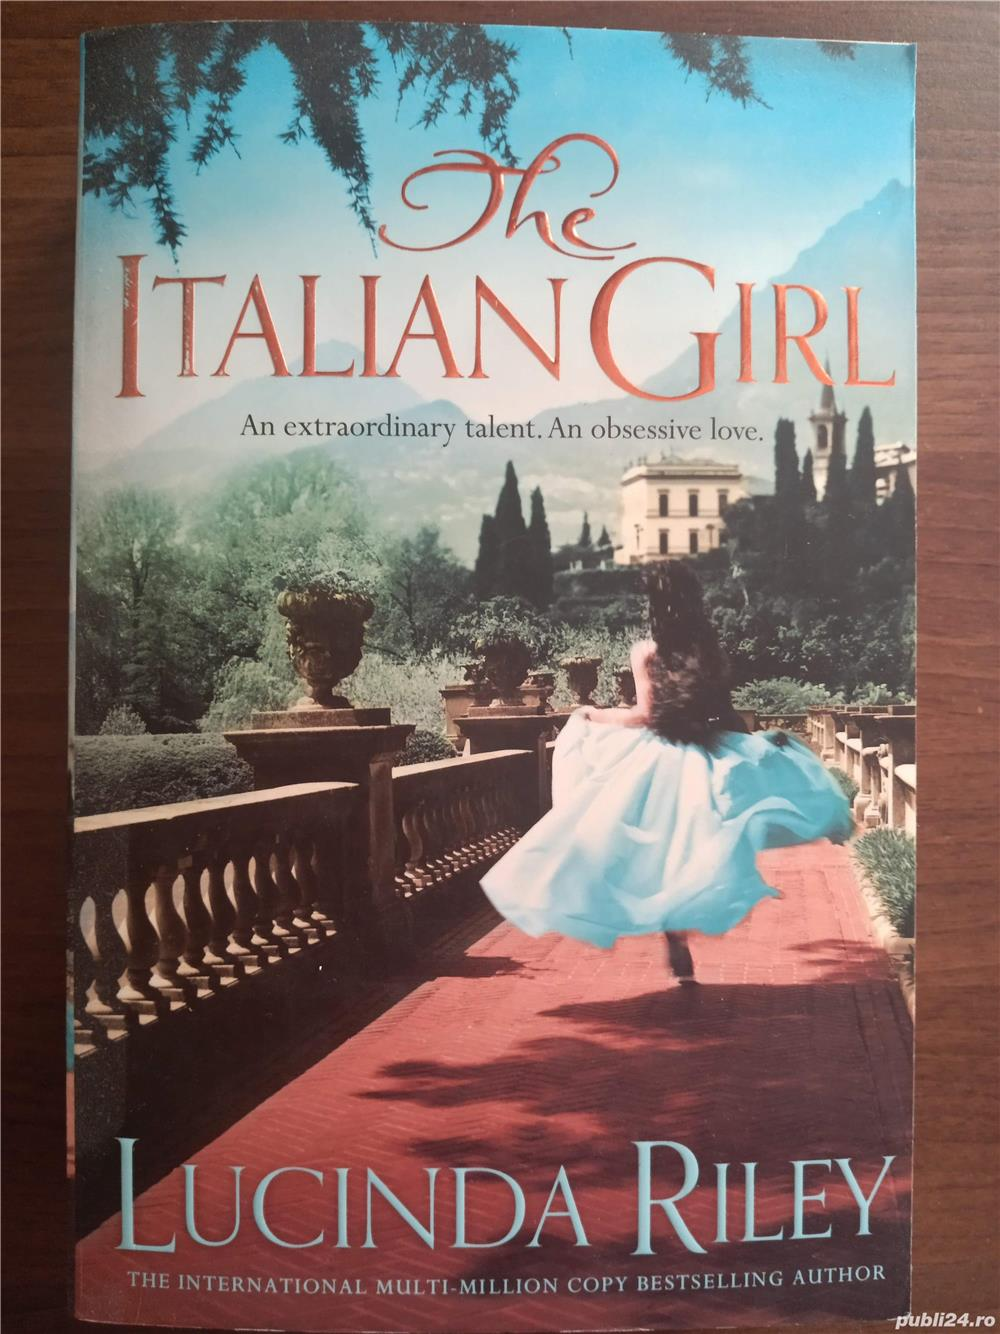 The Italian Girl - Lucinda Riley (English Version)